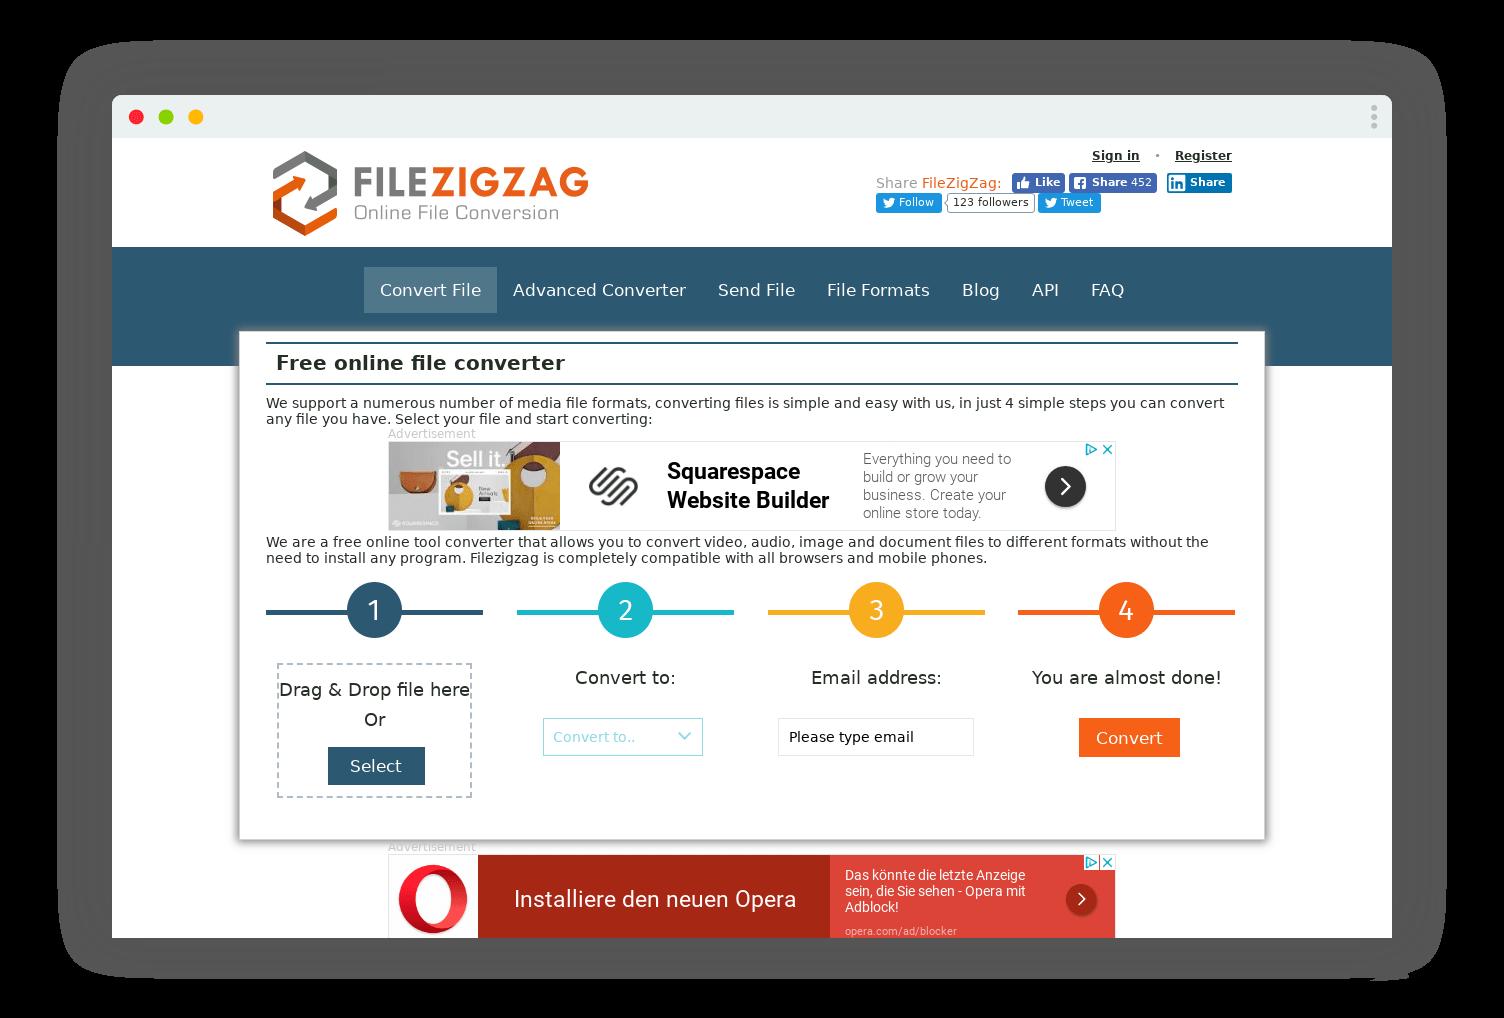 filezigzag conversion format